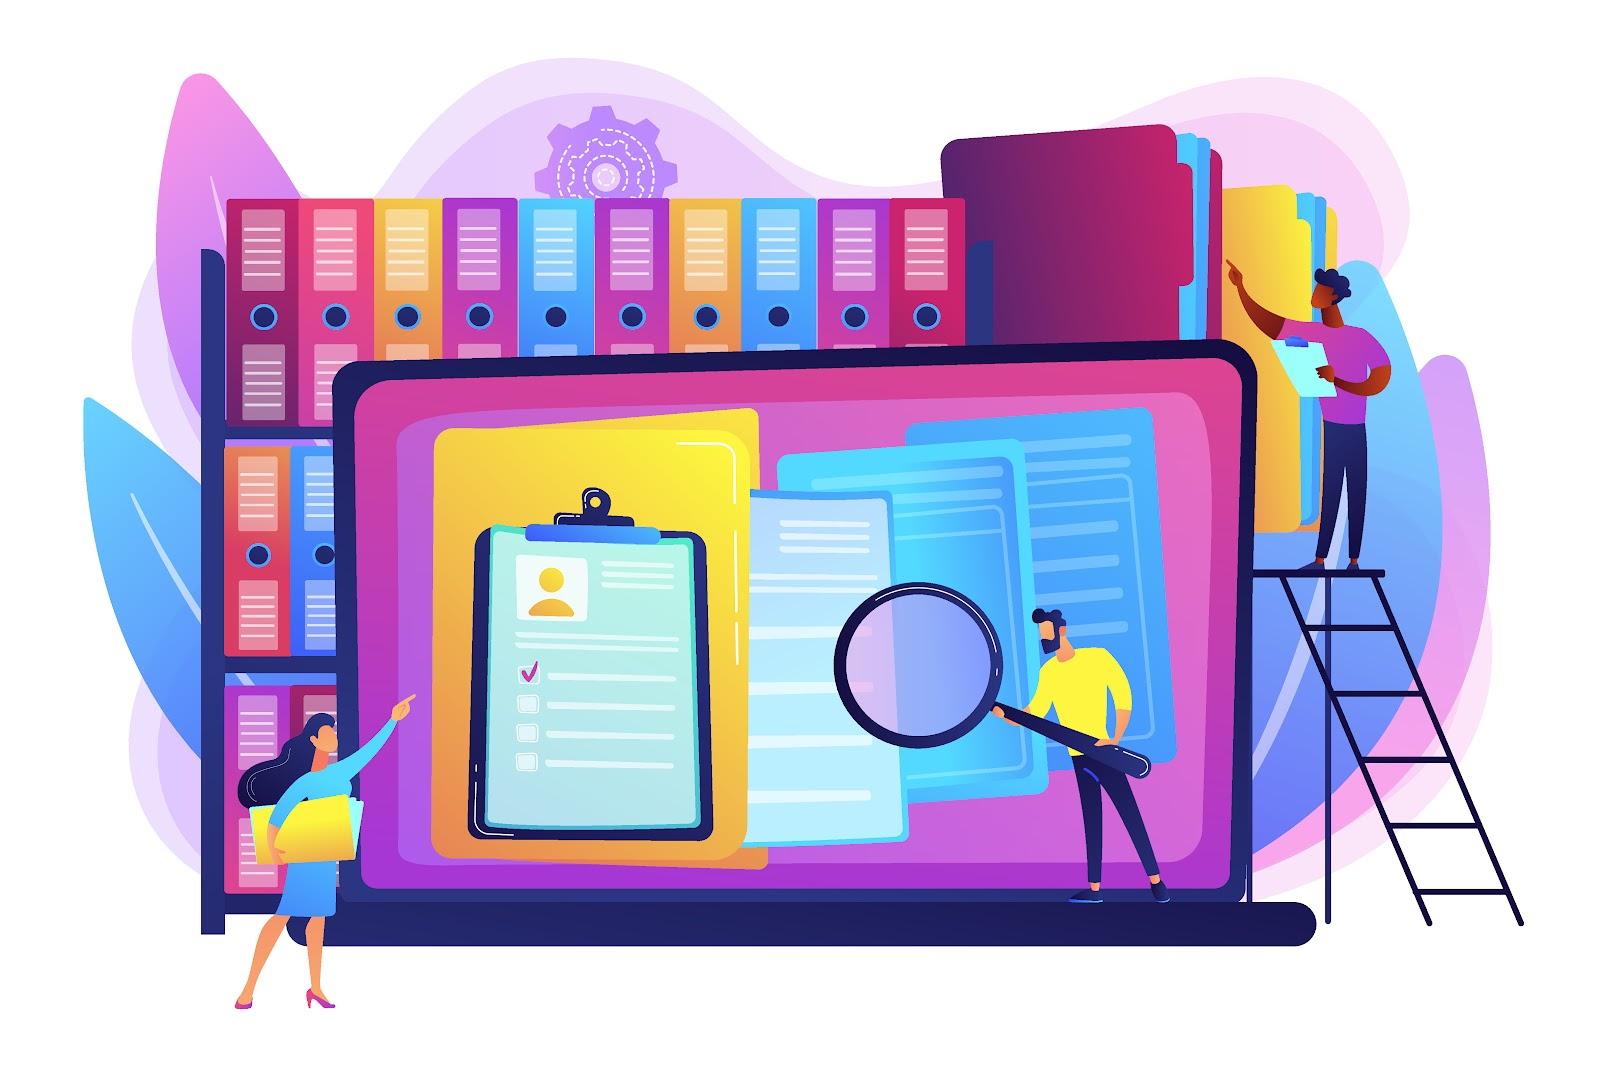 HR reviewing resume  illustration